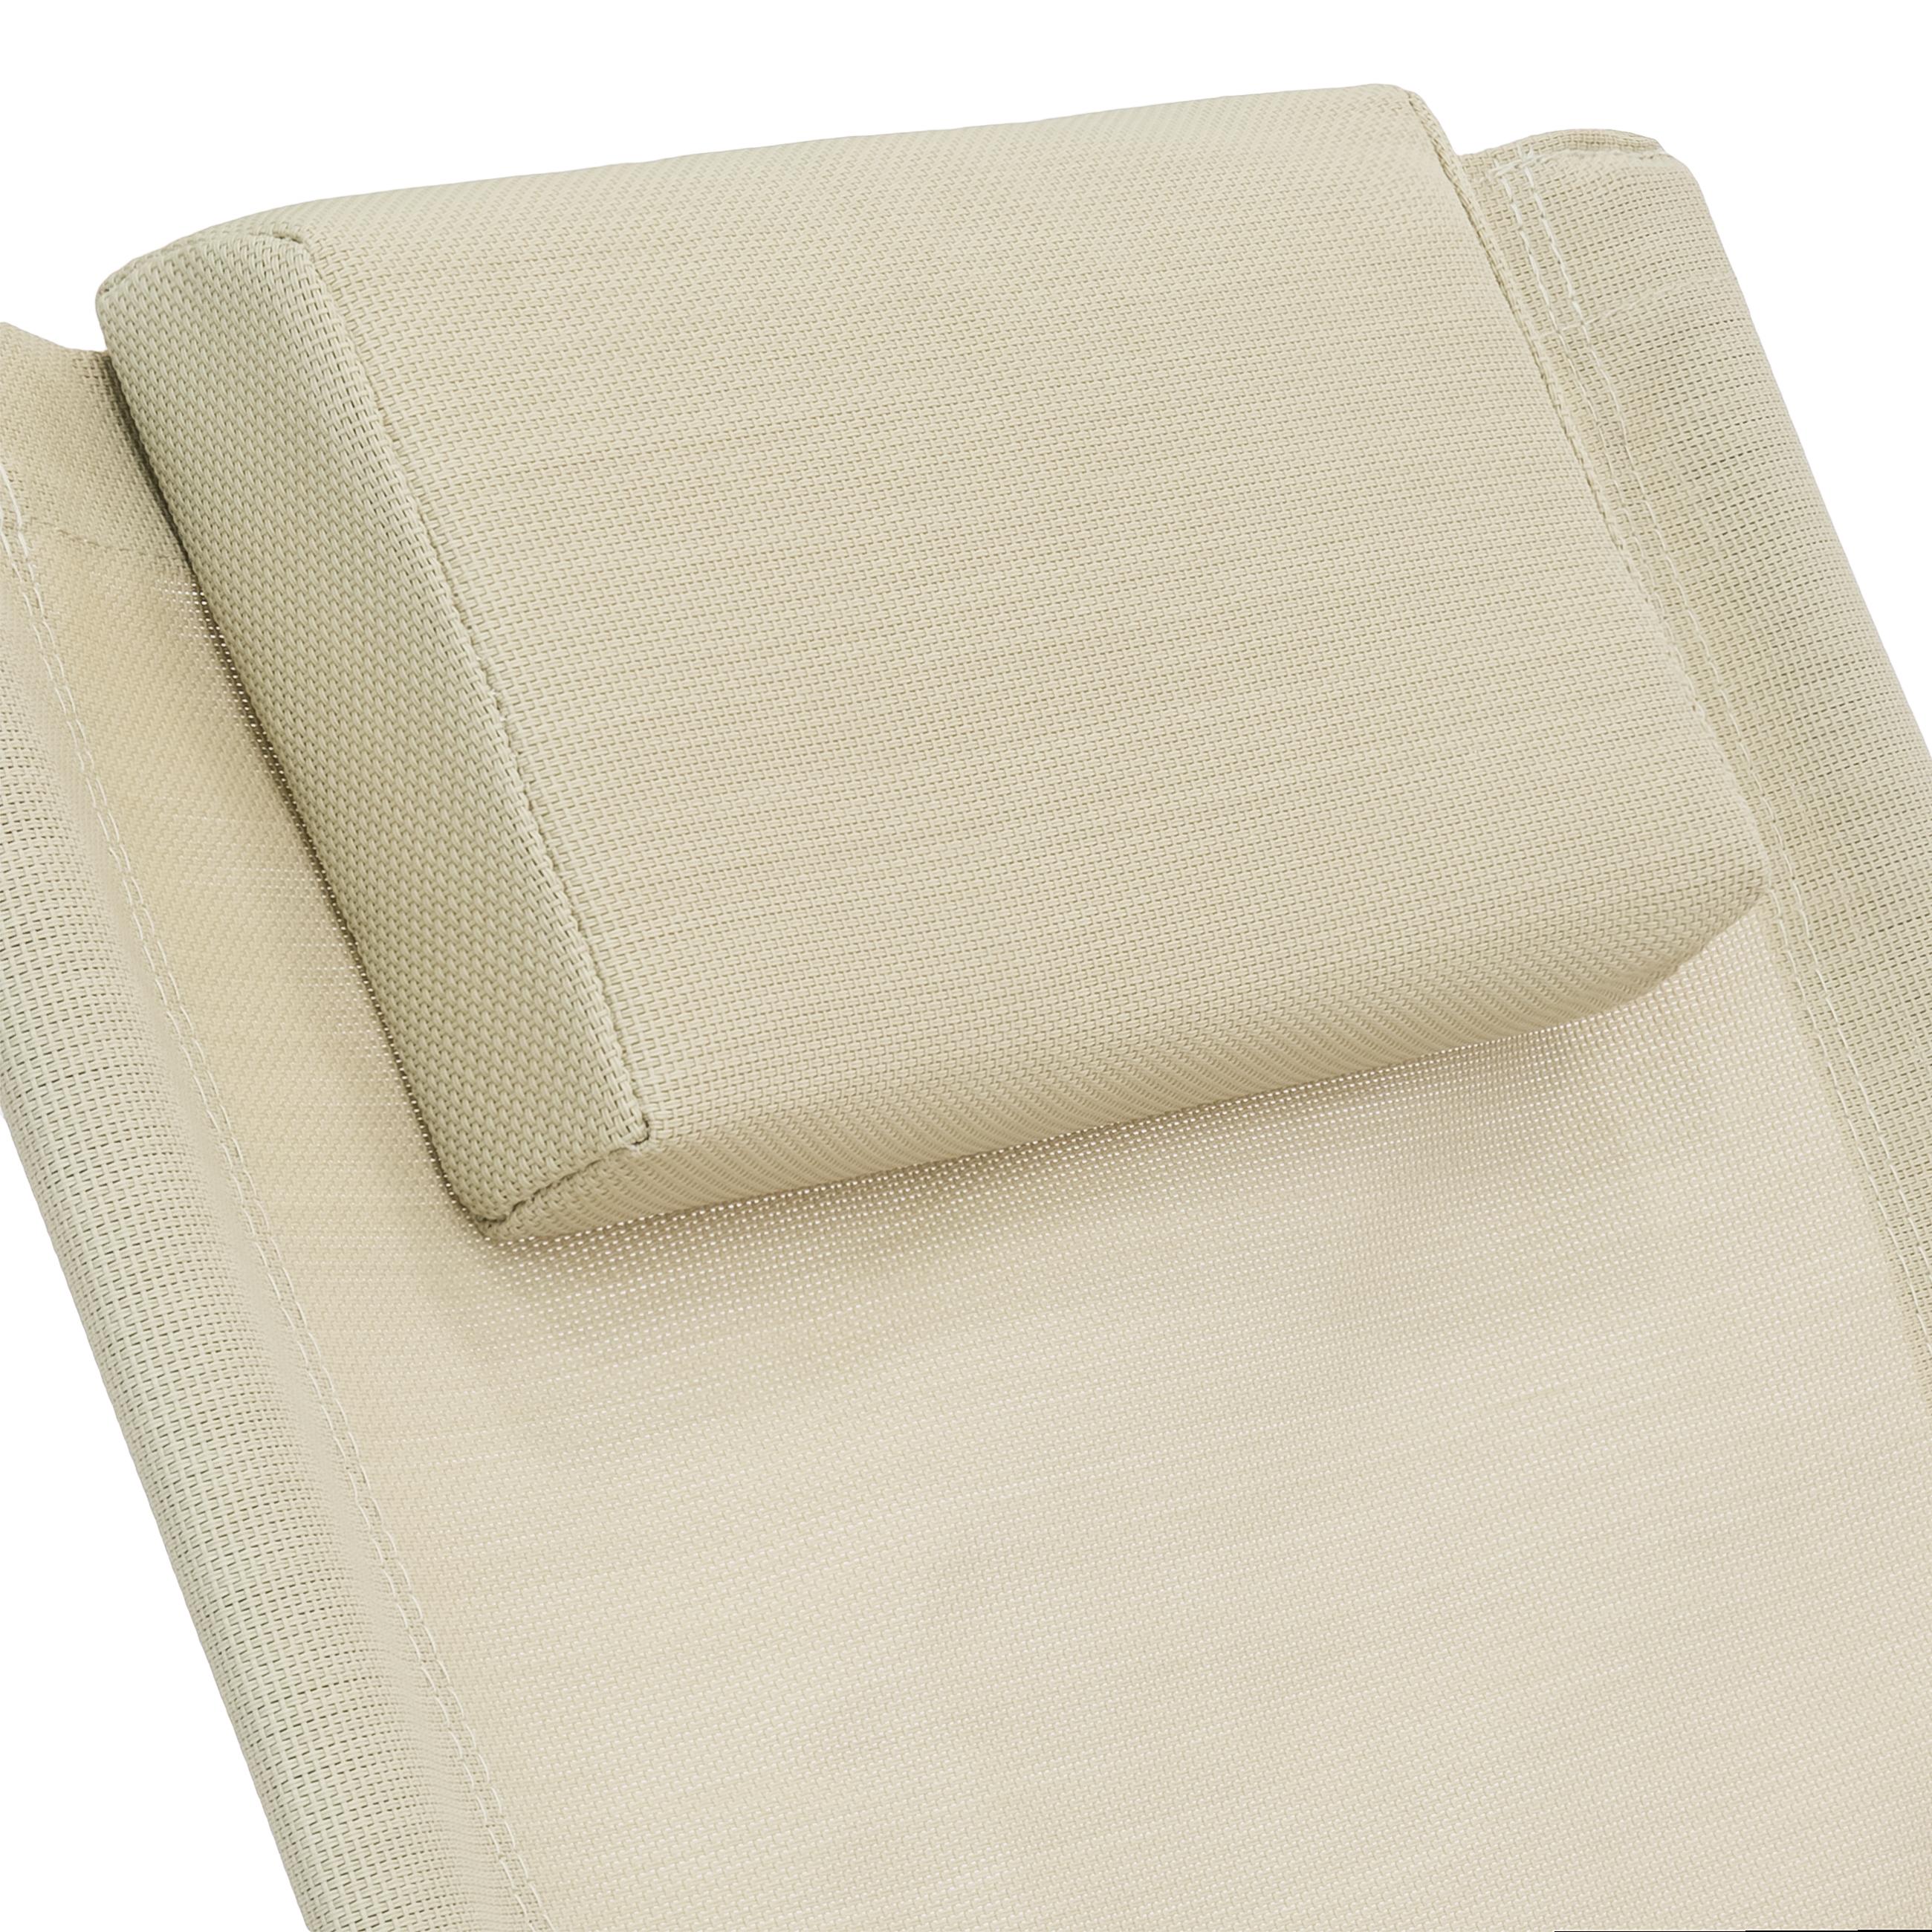 Bcp Outdoor Folding Zero Gravity Orbital Seat Chair W